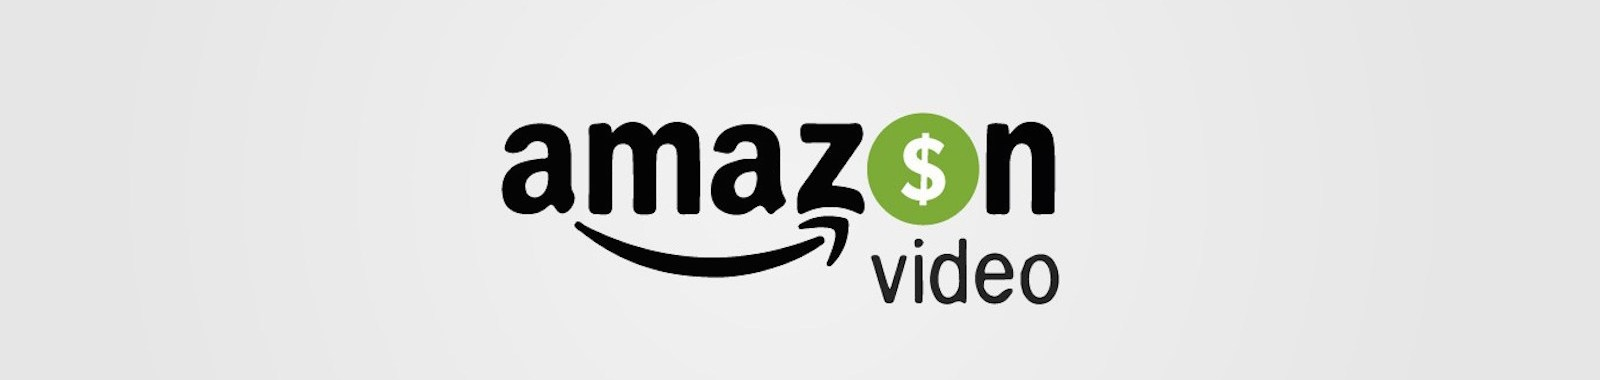 amazonVideo-featured